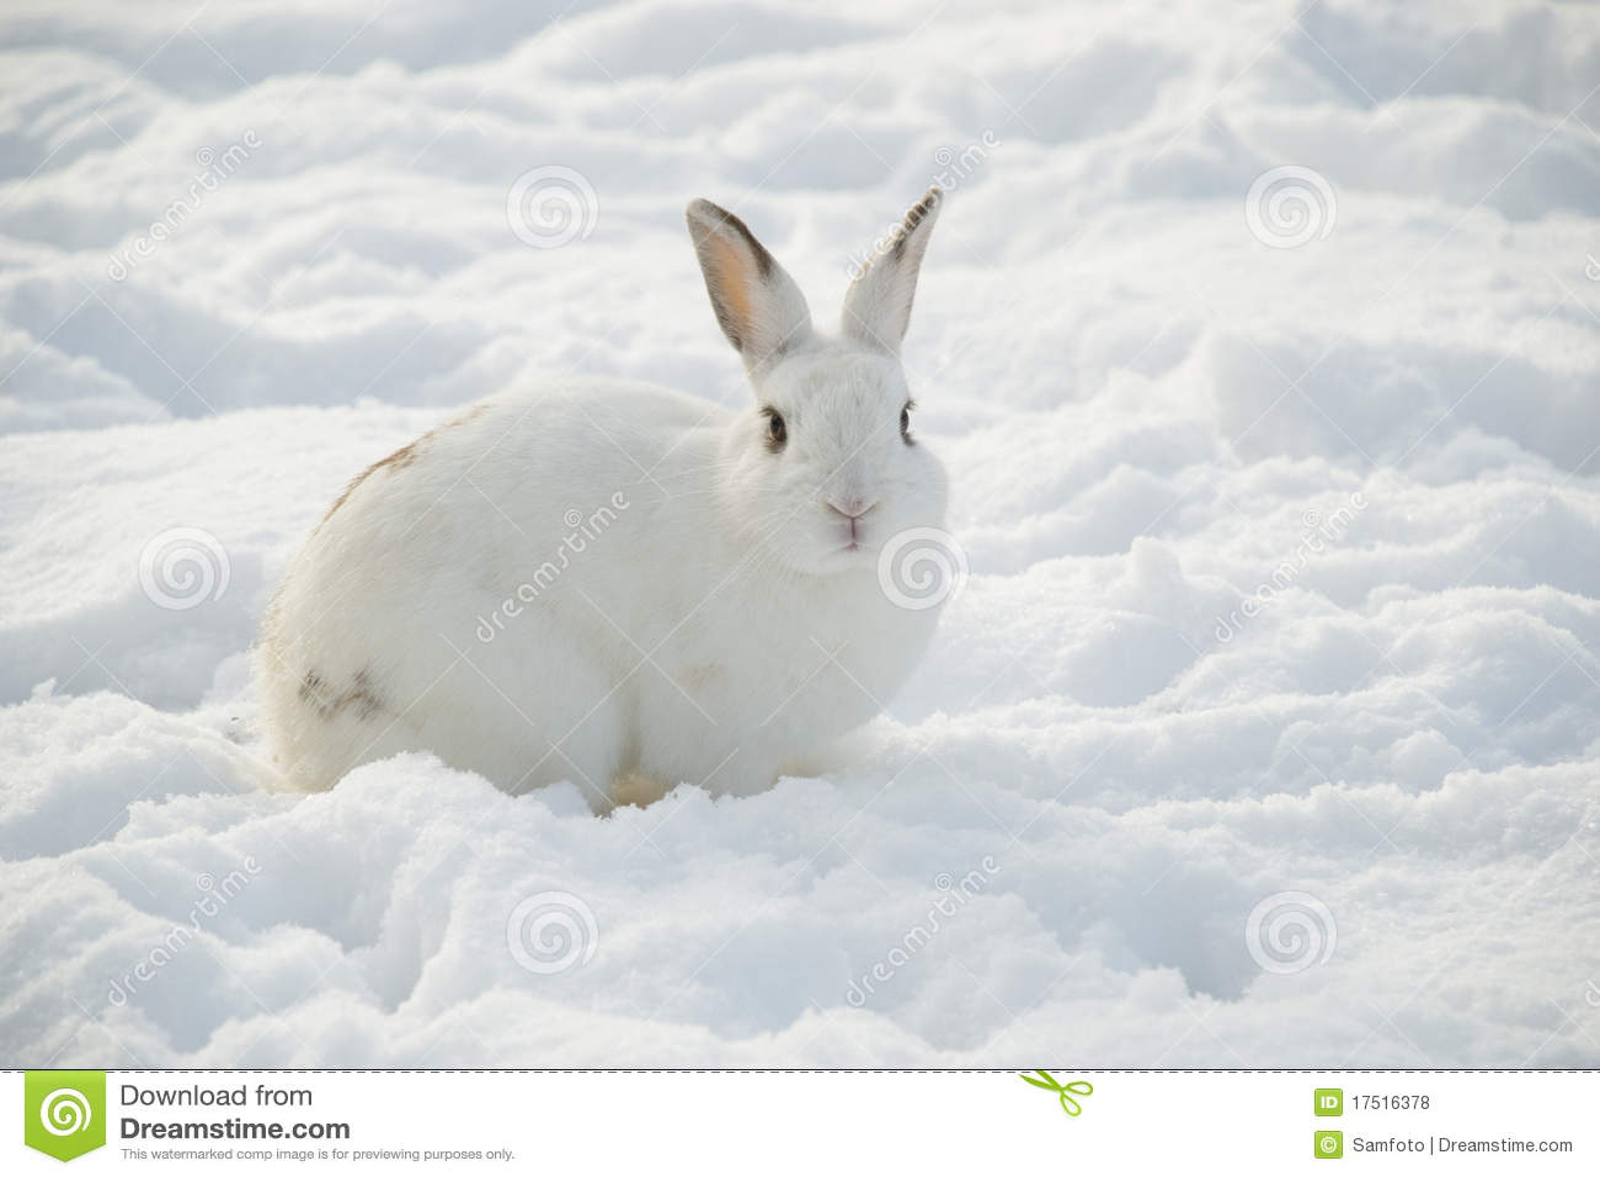 animals white rabbit snow - photo #16